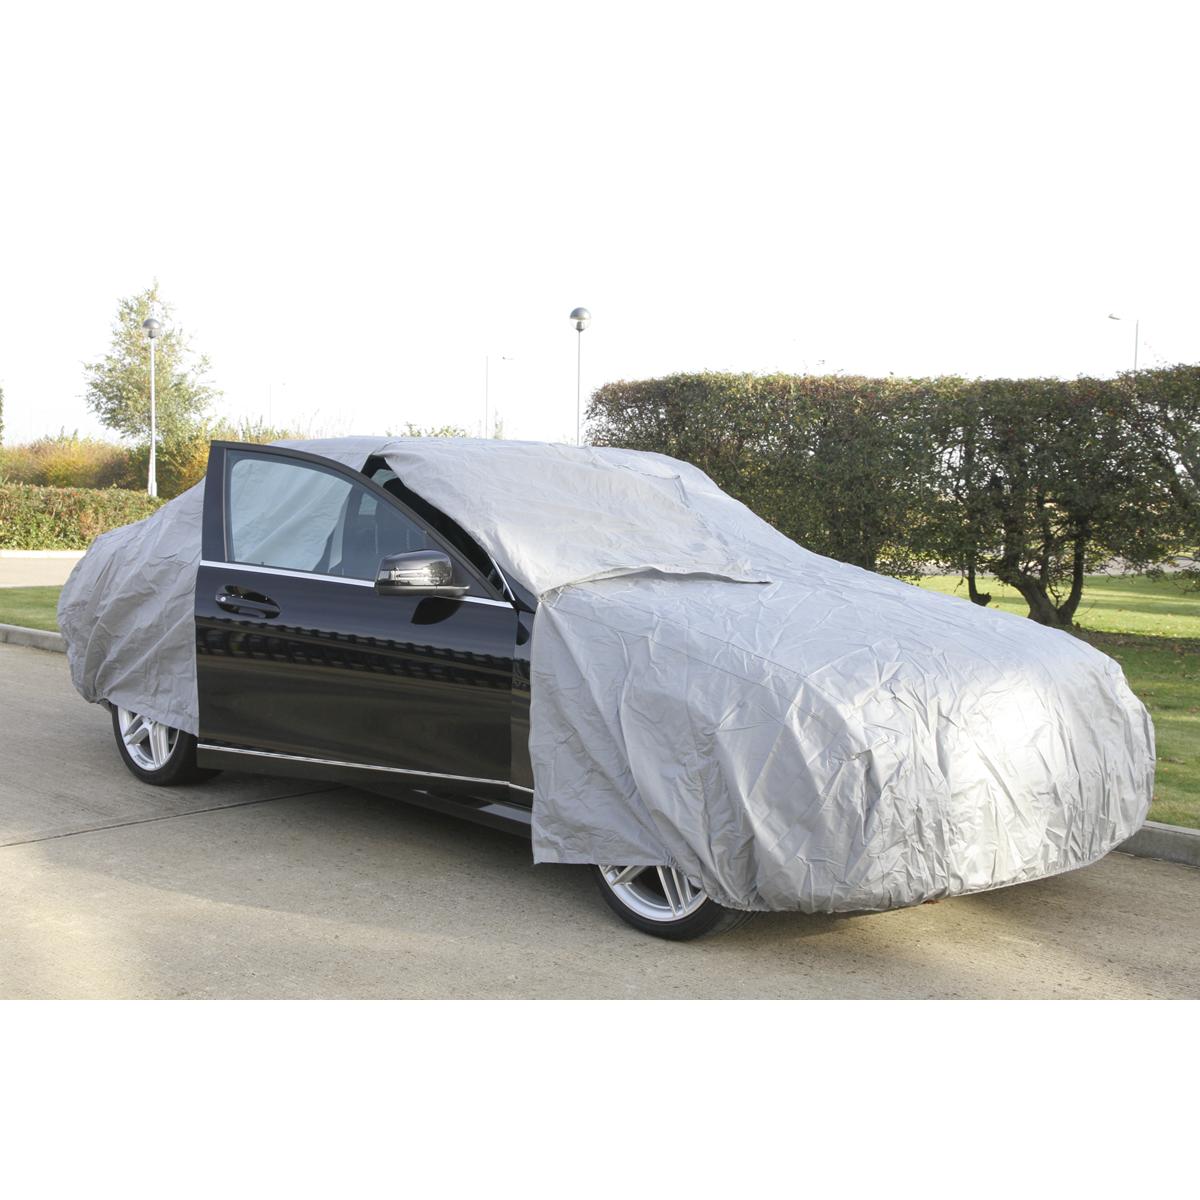 Car Cover Medium 4060 x 1650 x 1220mm